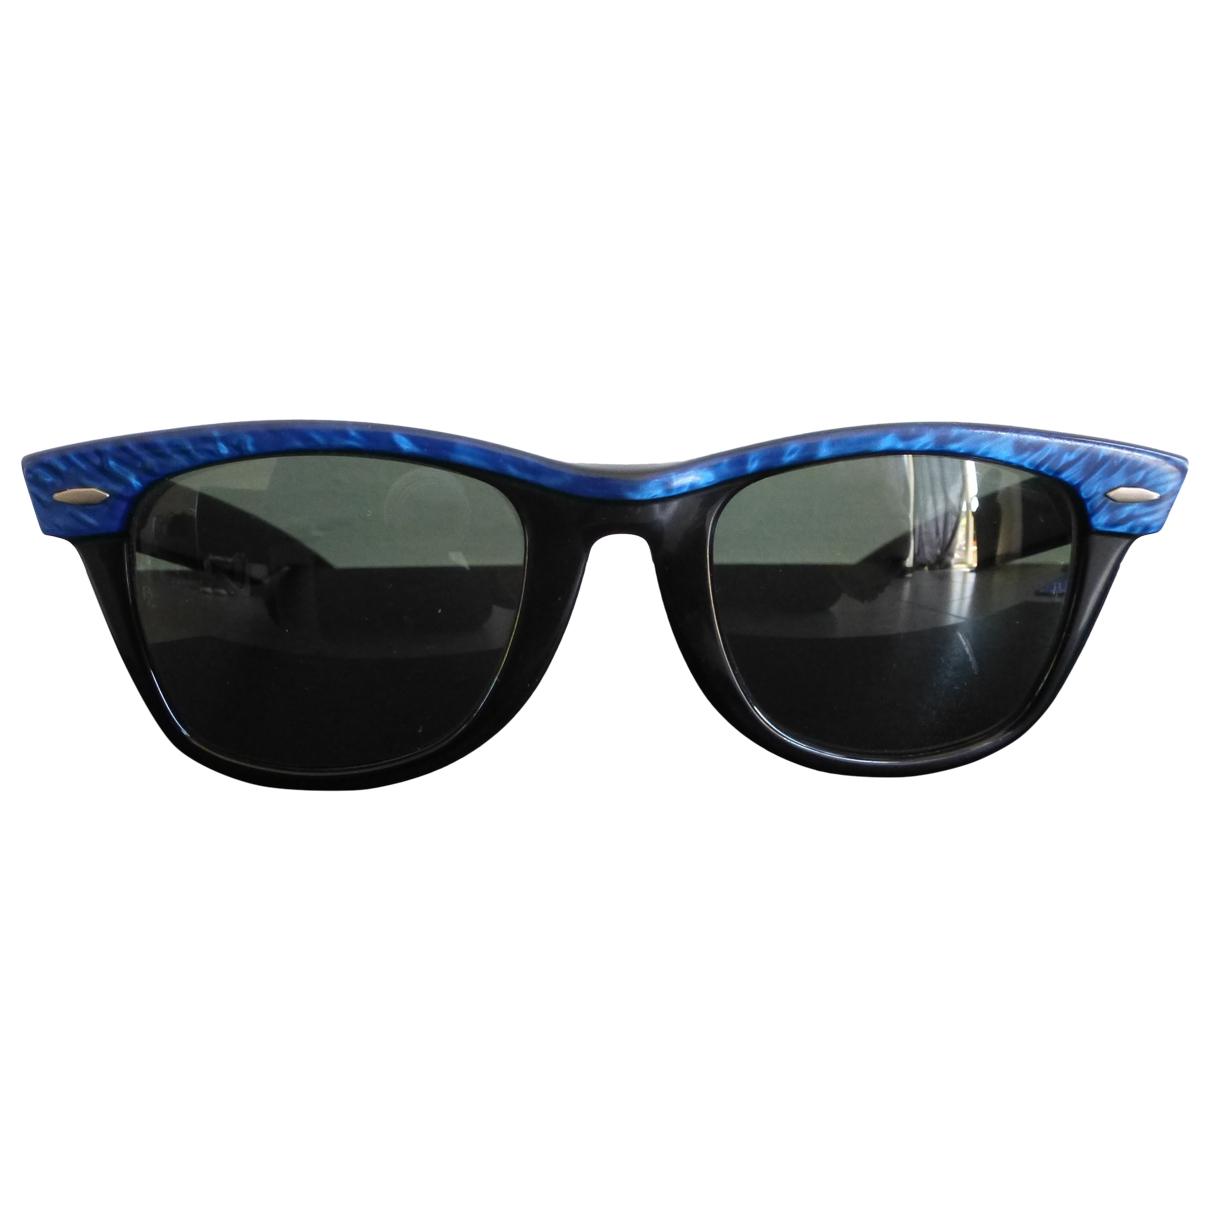 Ray-ban Original Wayfarer Sonnenbrillen in  Blau Kunststoff